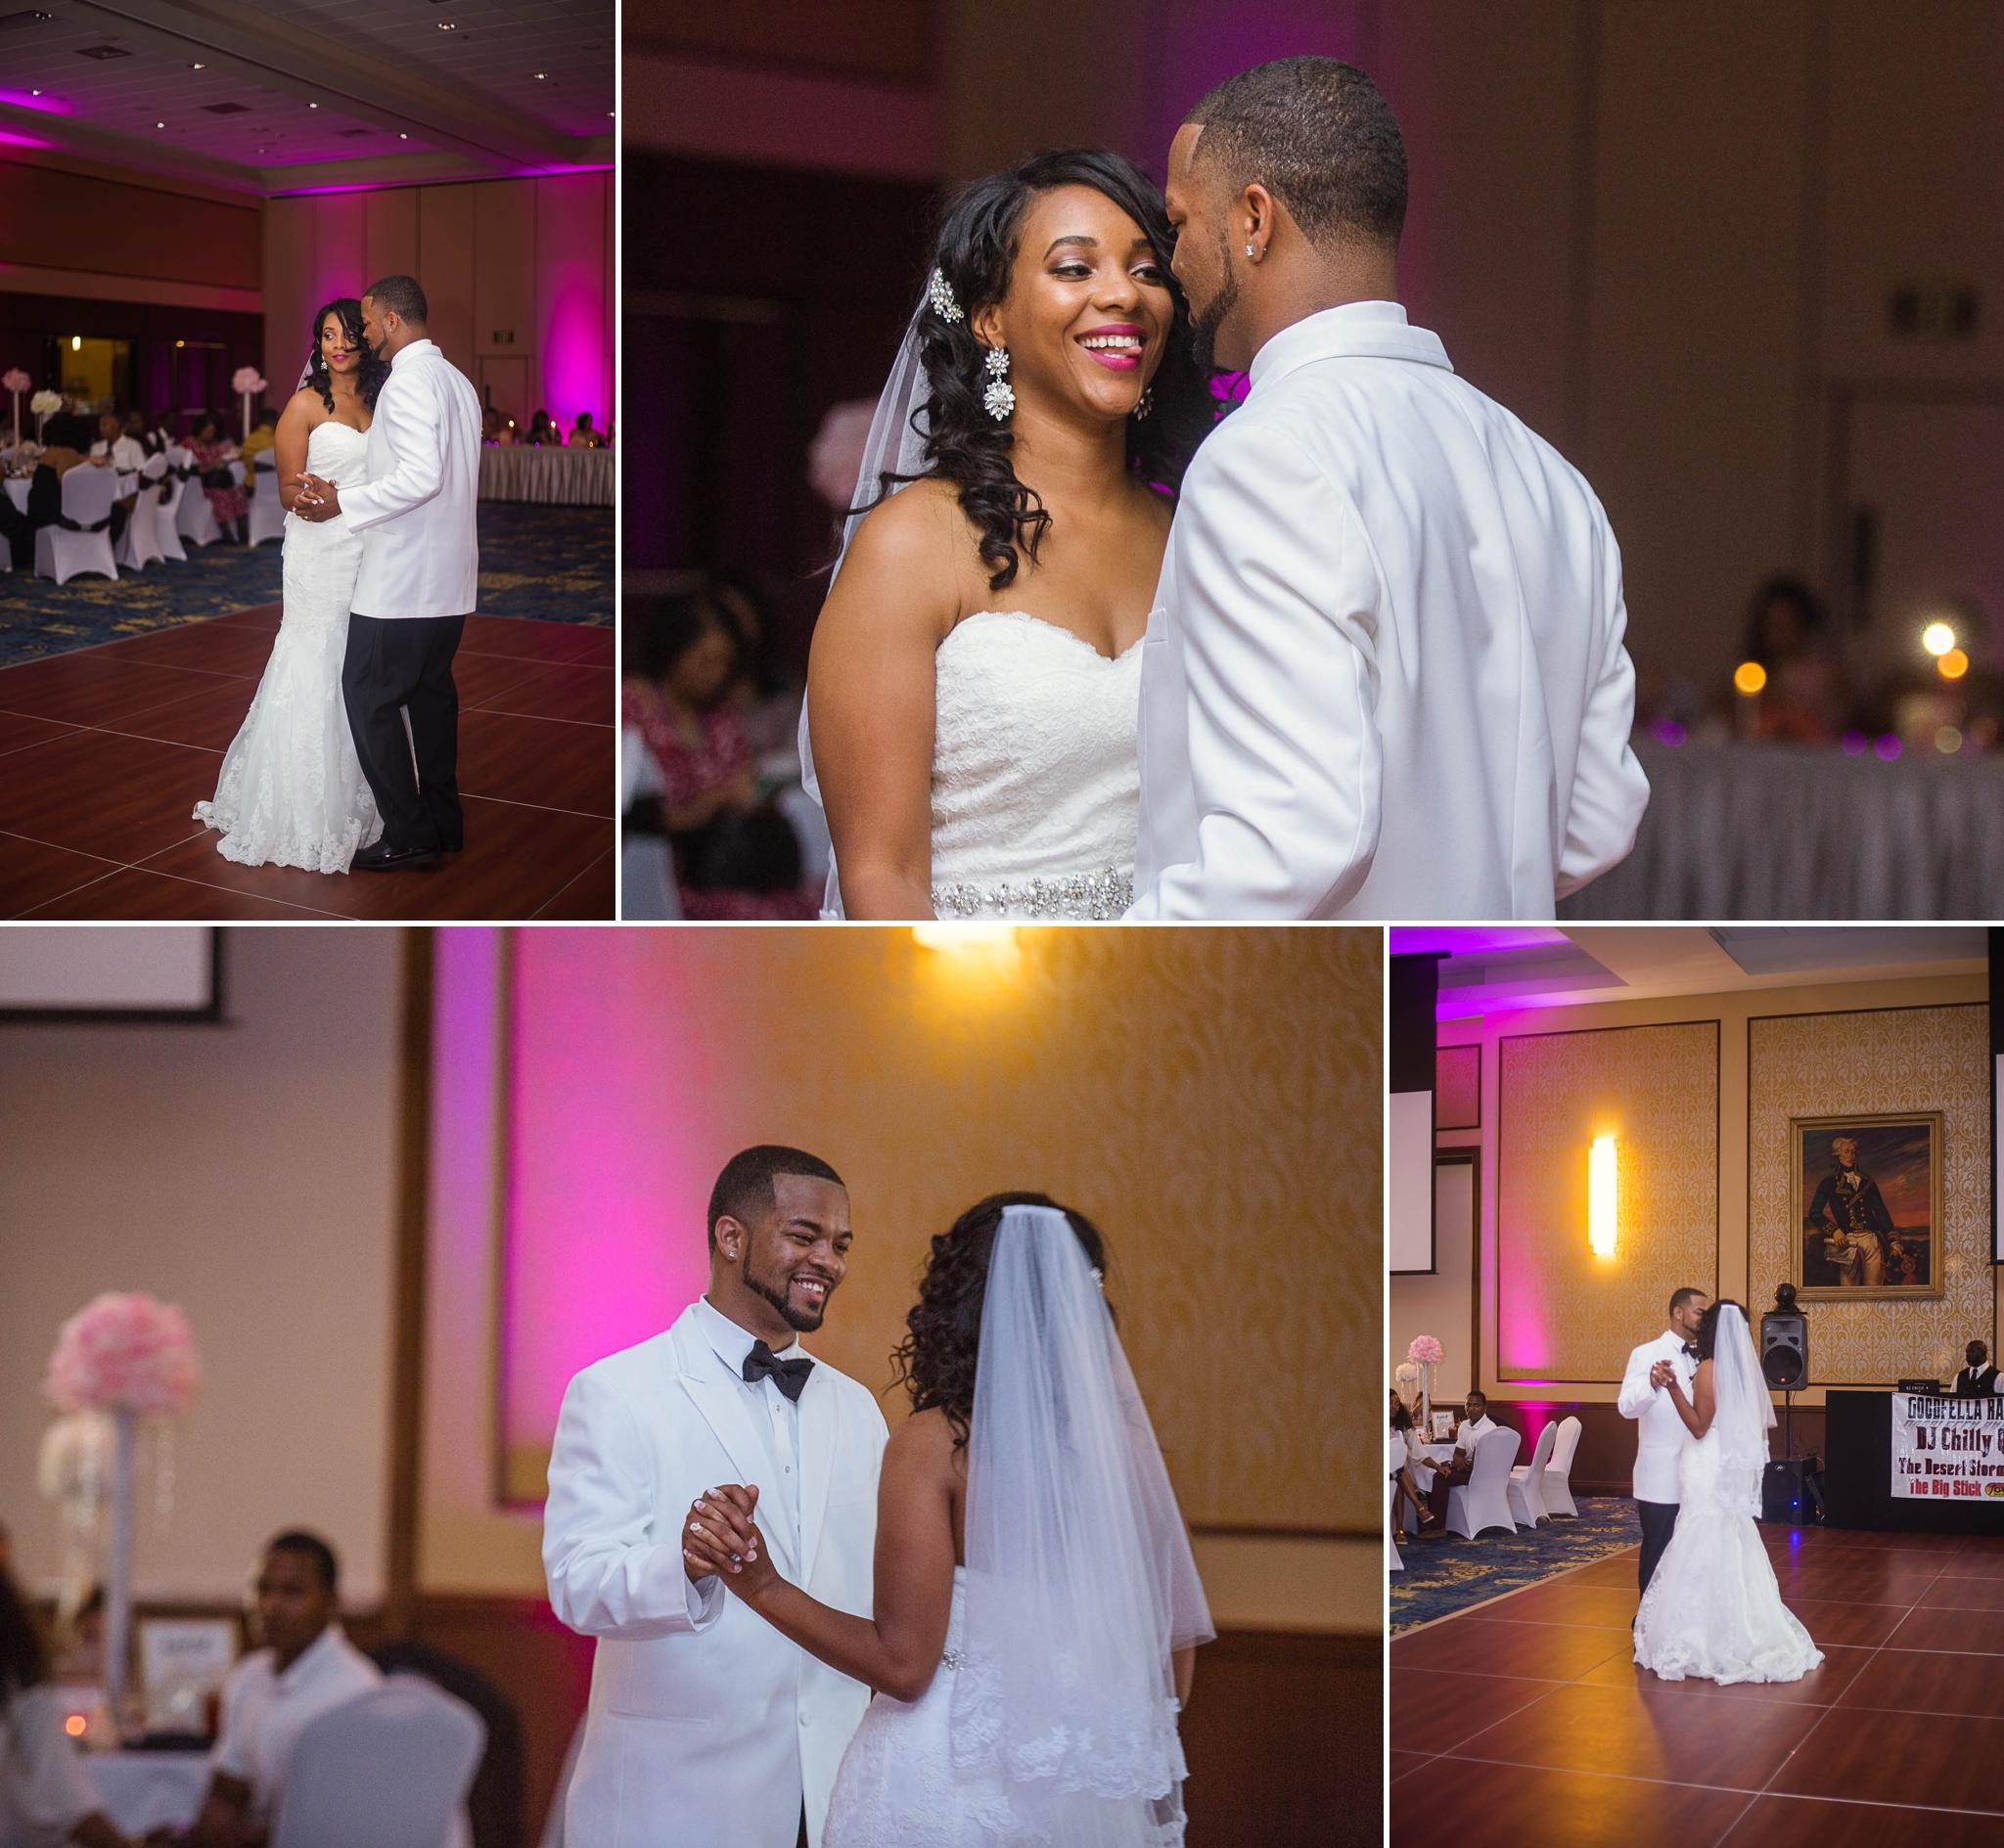 Wedding reception at fort bragg conference & catering center north carolina